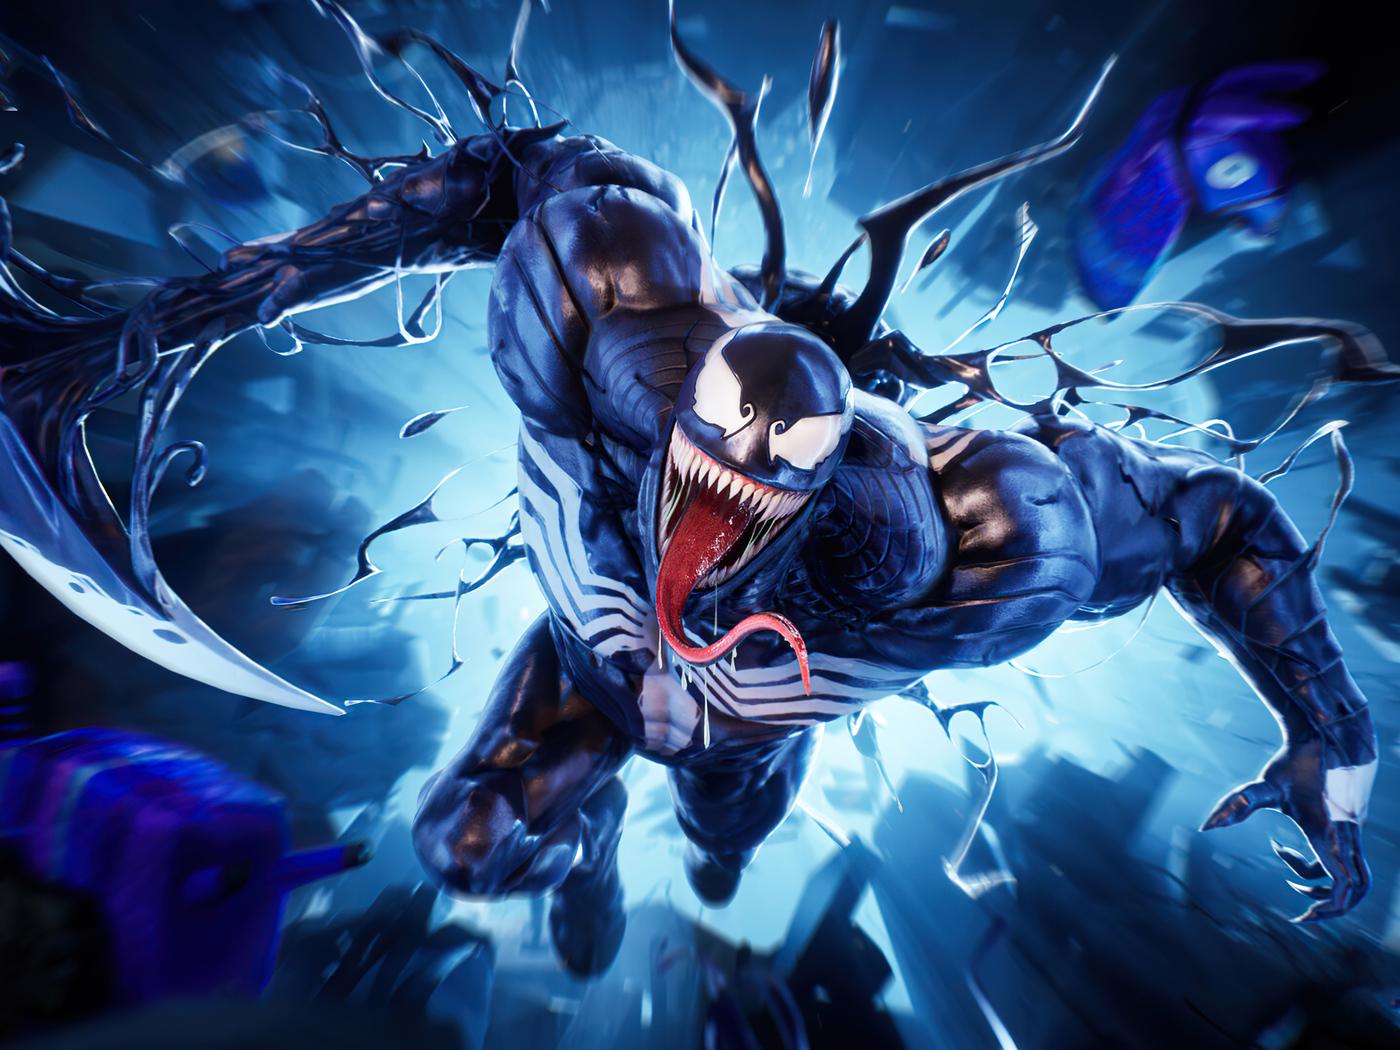 1400x1050 Venom Fortnite 1400x1050 Resolution HD 4k ...